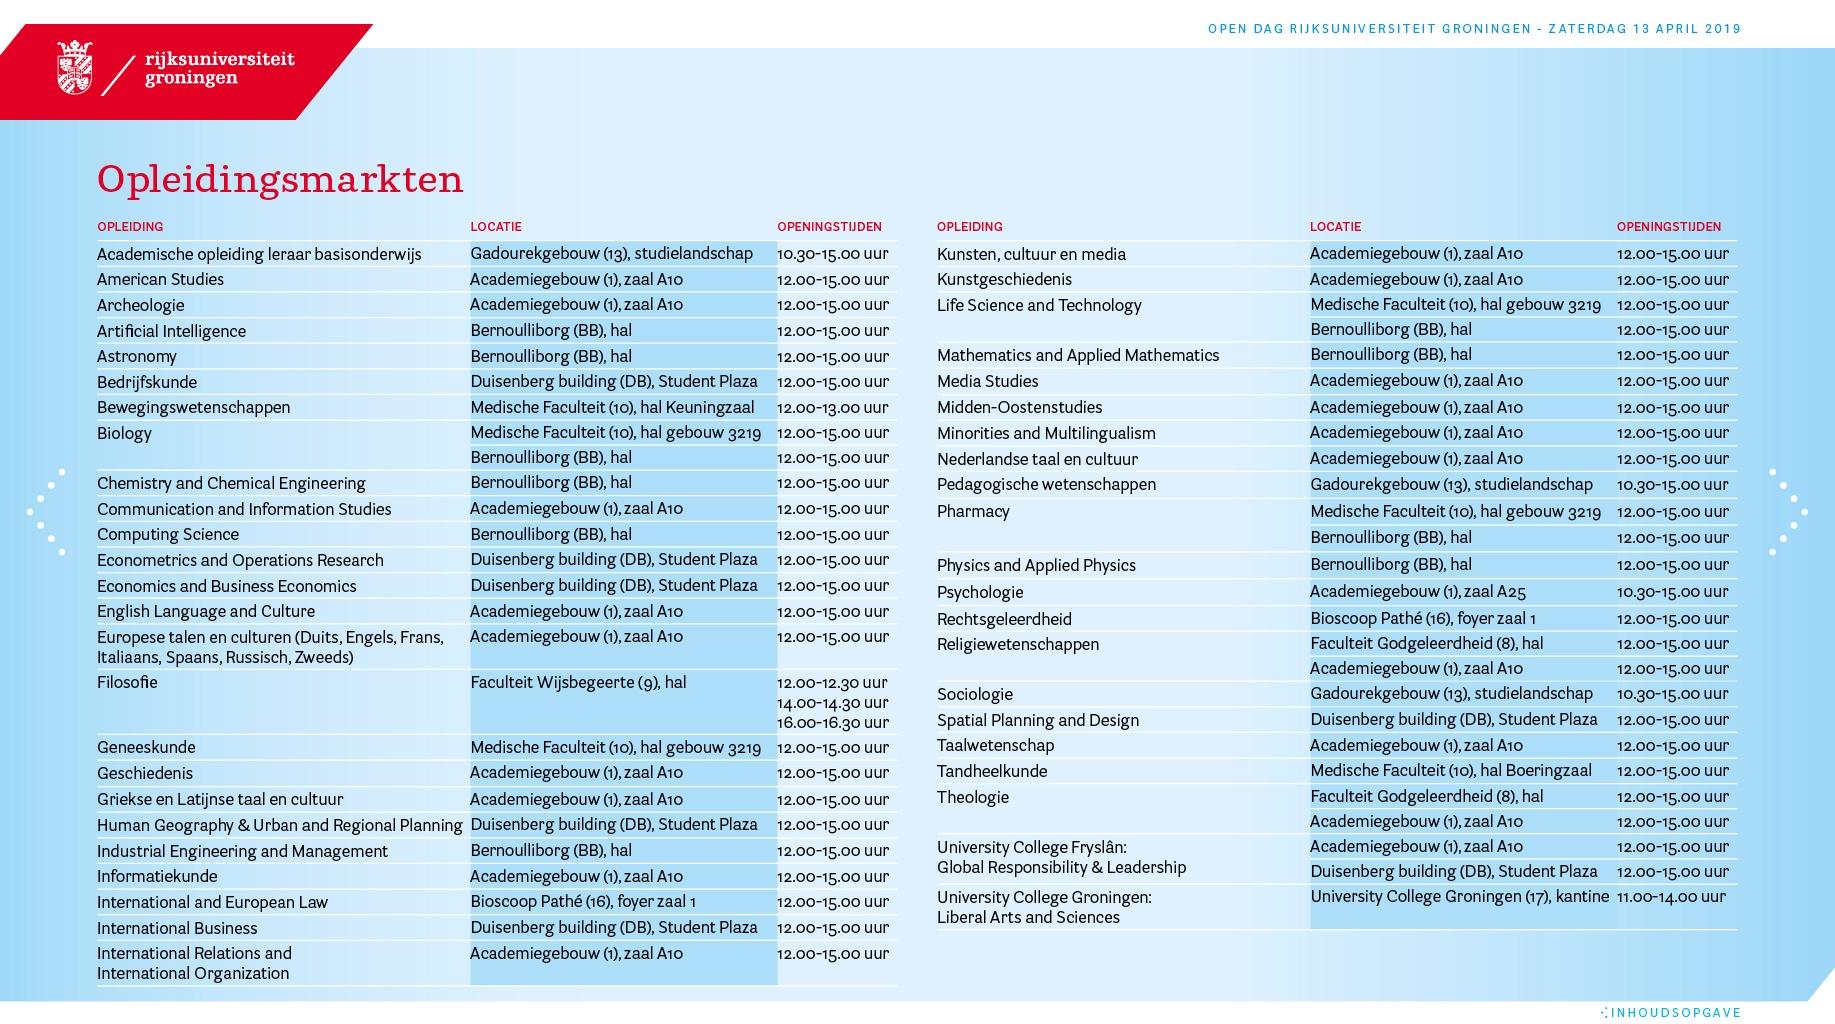 tabel opleidingsmarkten rijksuniversiteit groningen